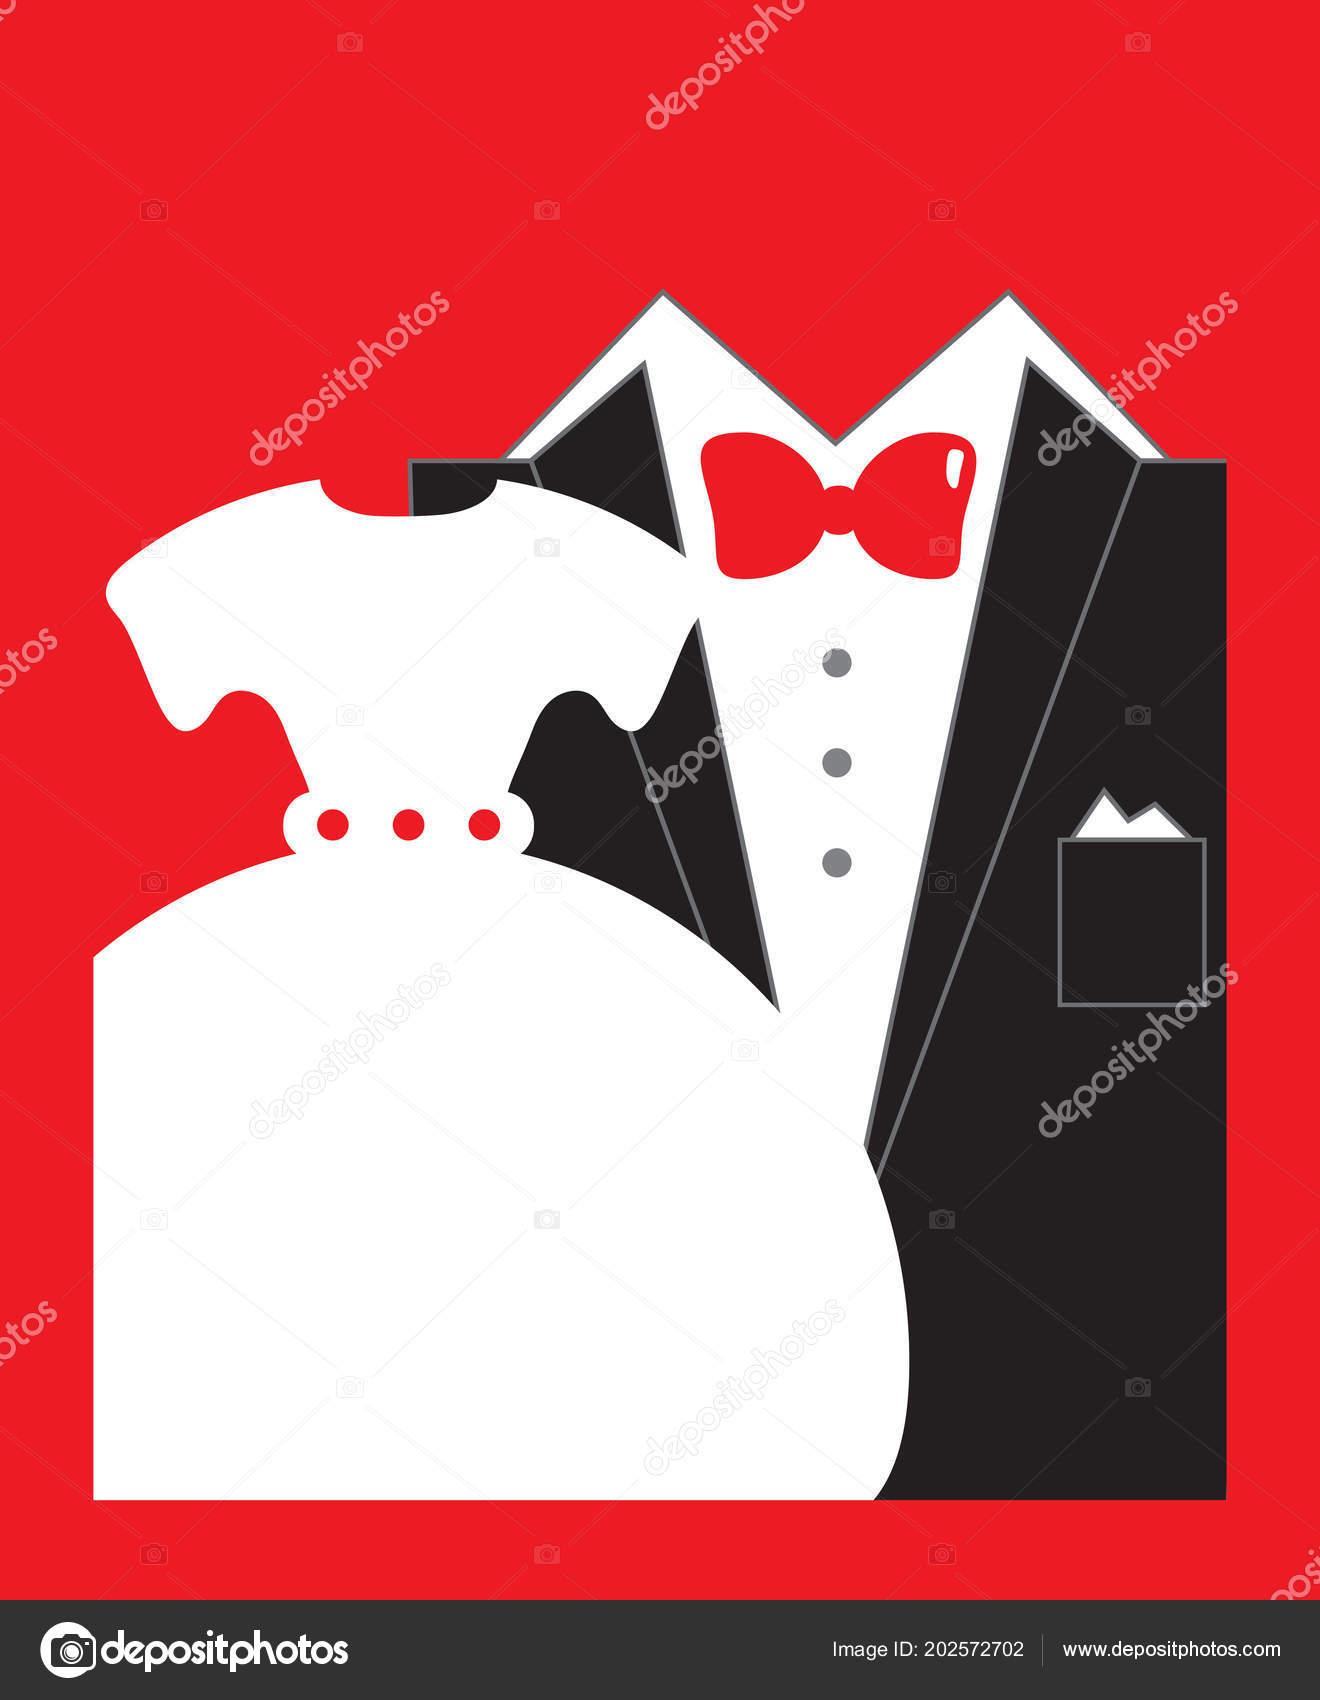 Bride Groom Wedding Invitation Red Black White Colors Copy Space ...